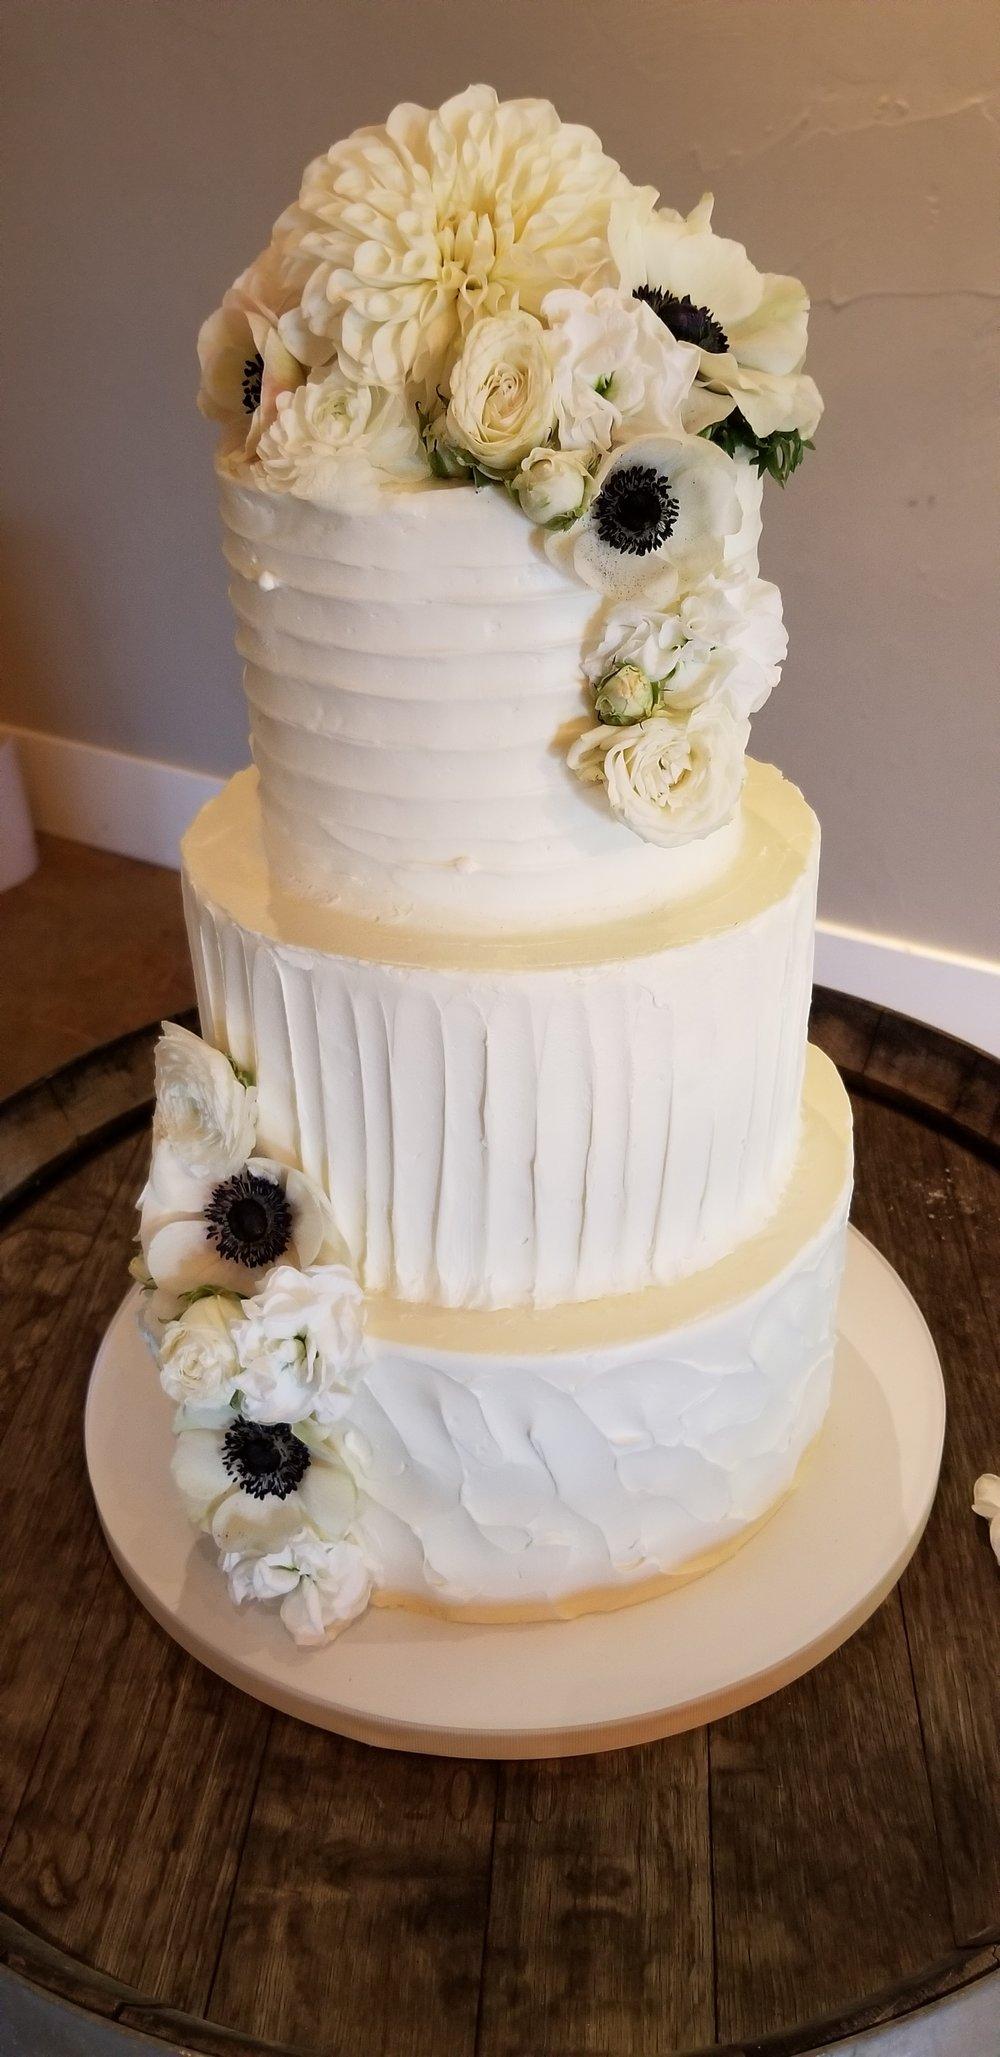 Wedding cake flowers, white dahlia and anemone.